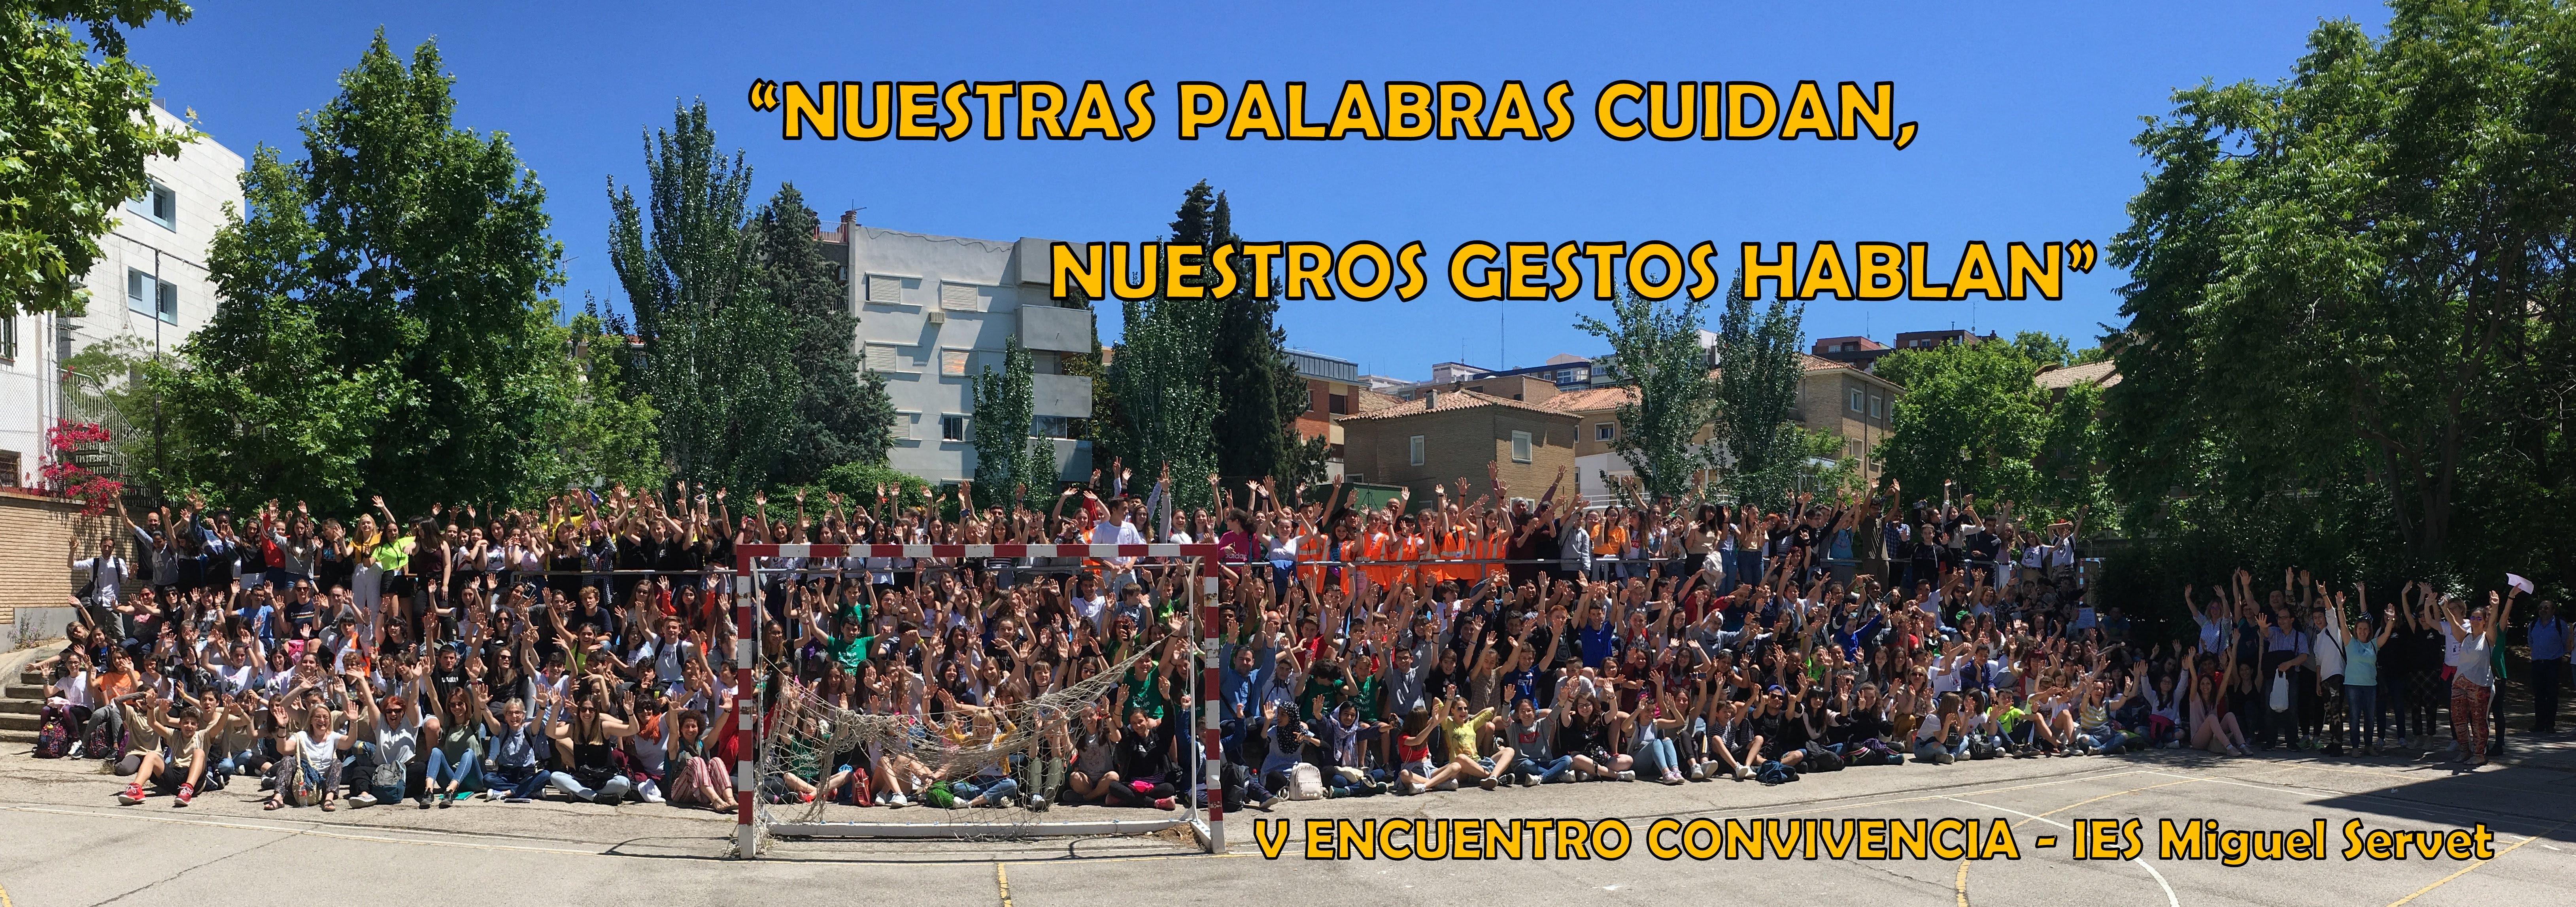 26-V_encuentro (89)